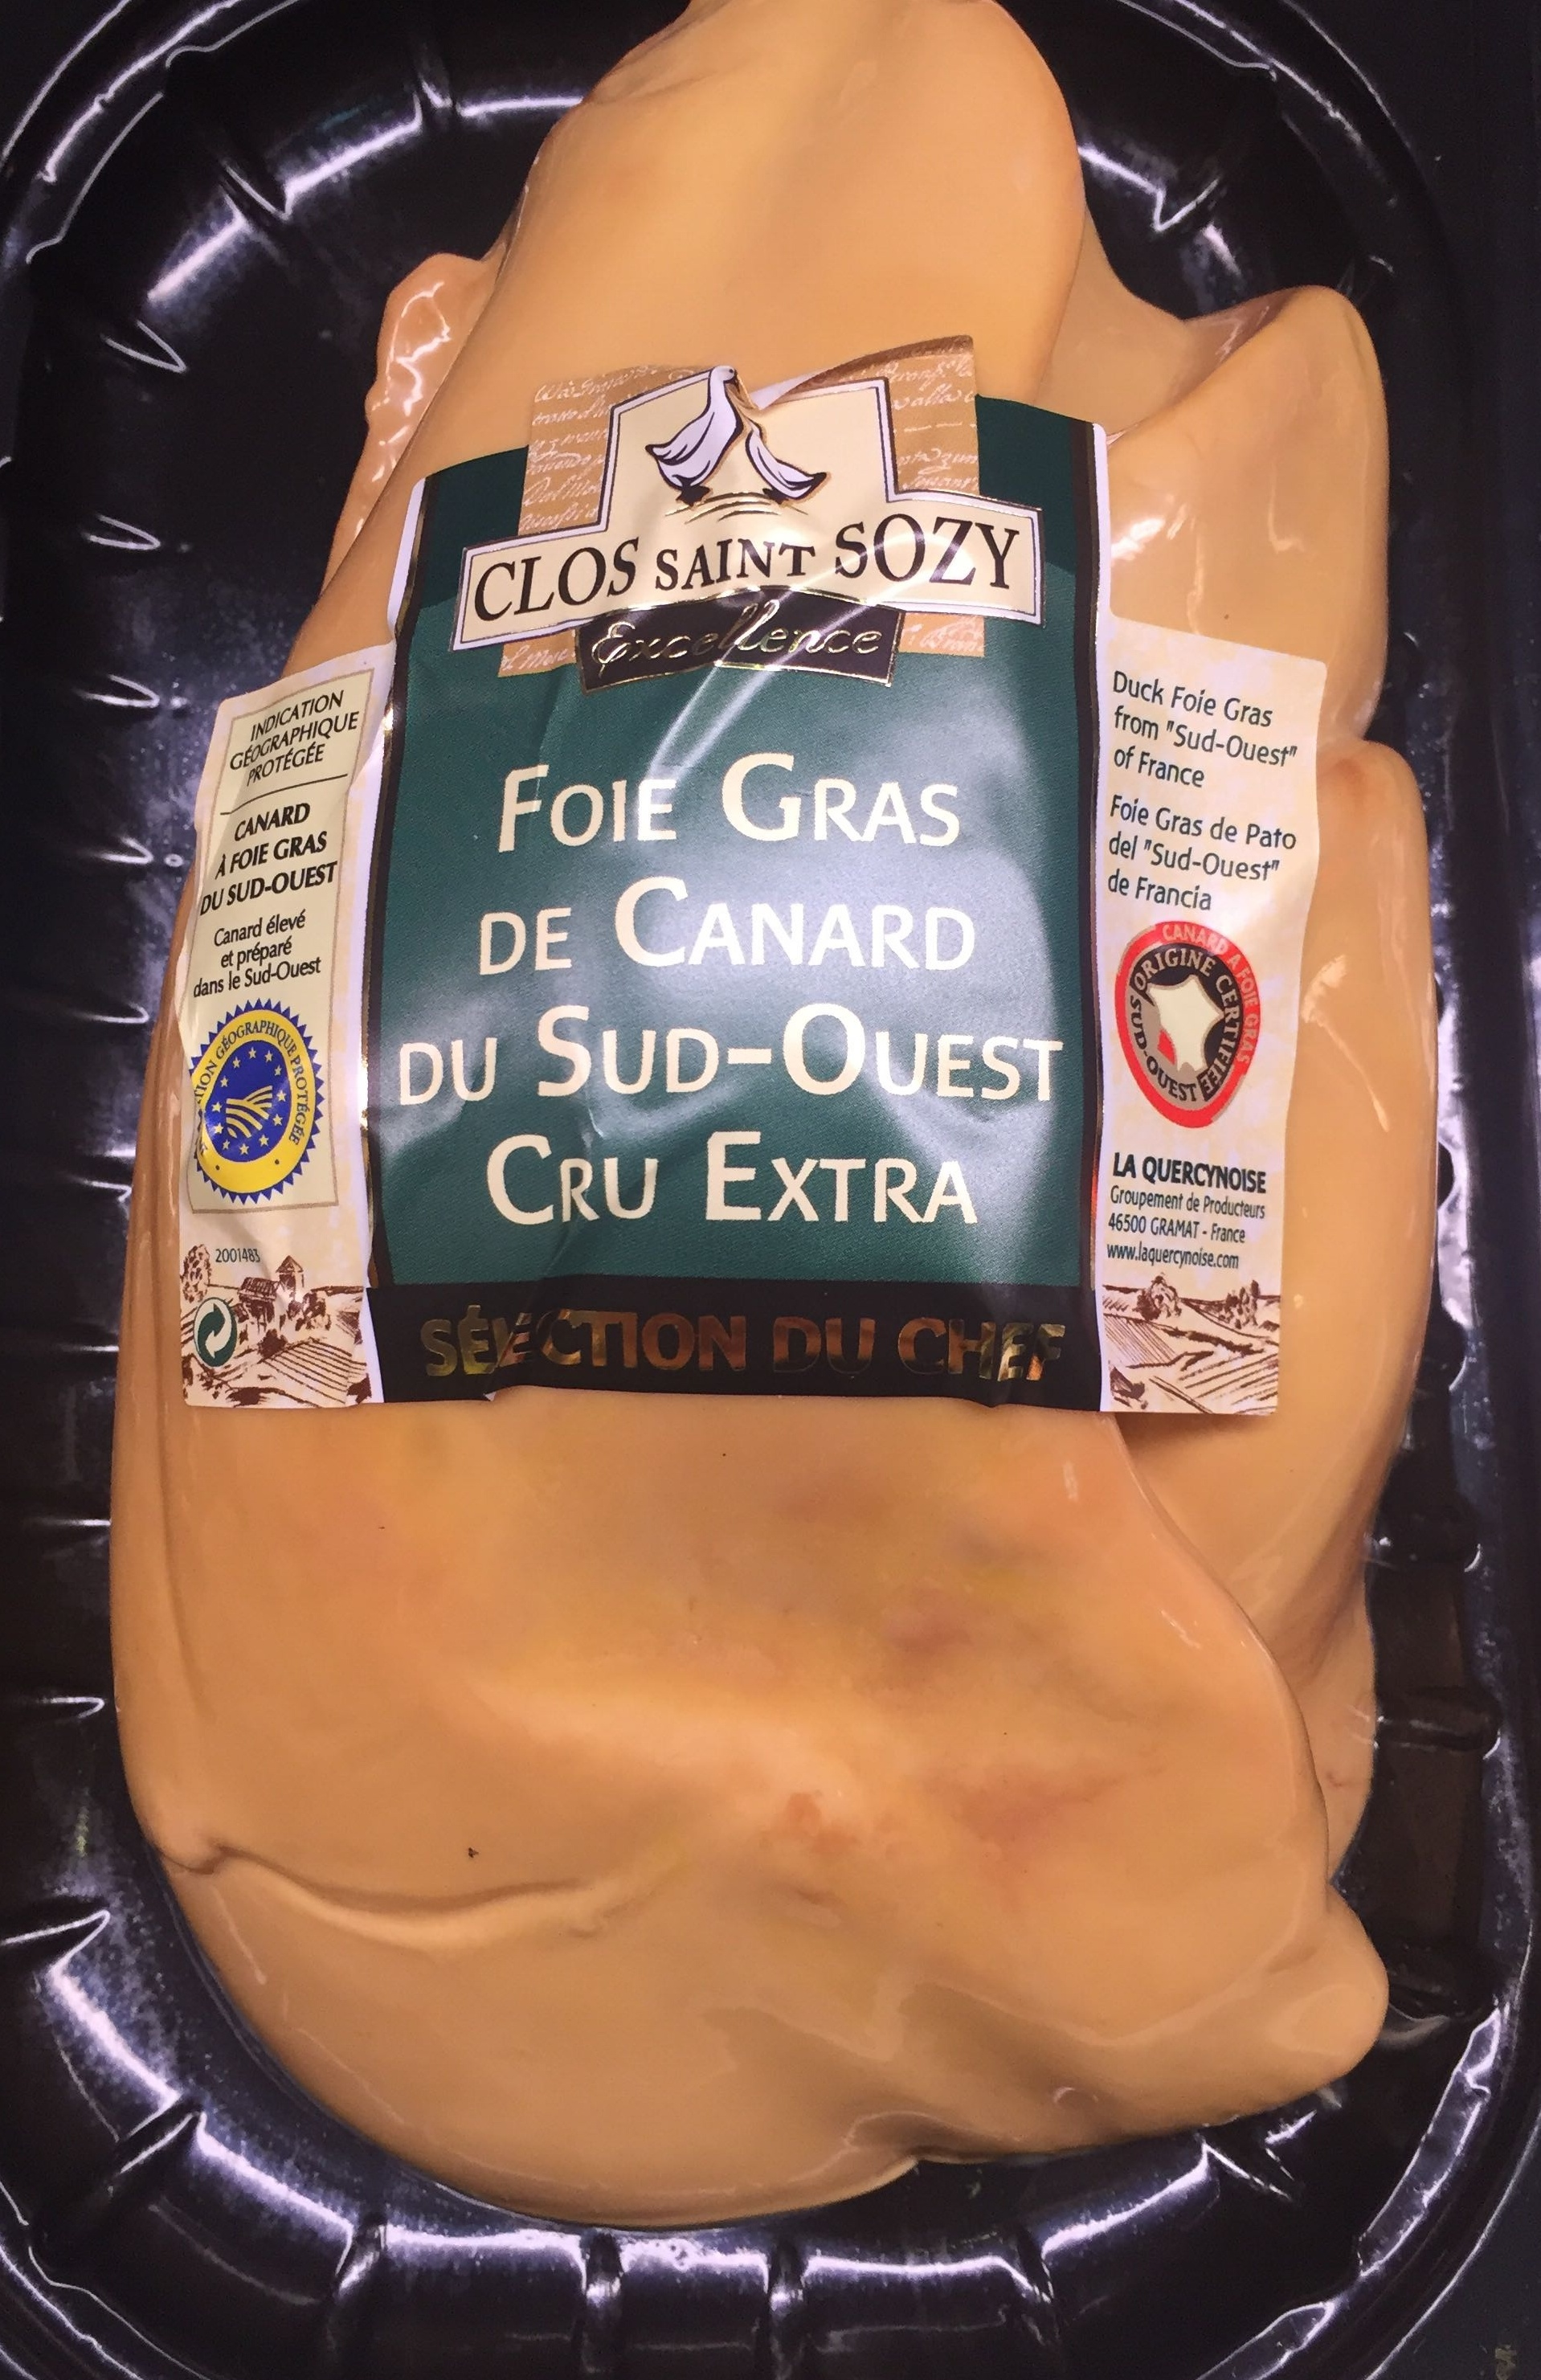 Foie gras de canard du Sud-Est cru extra - Product - fr